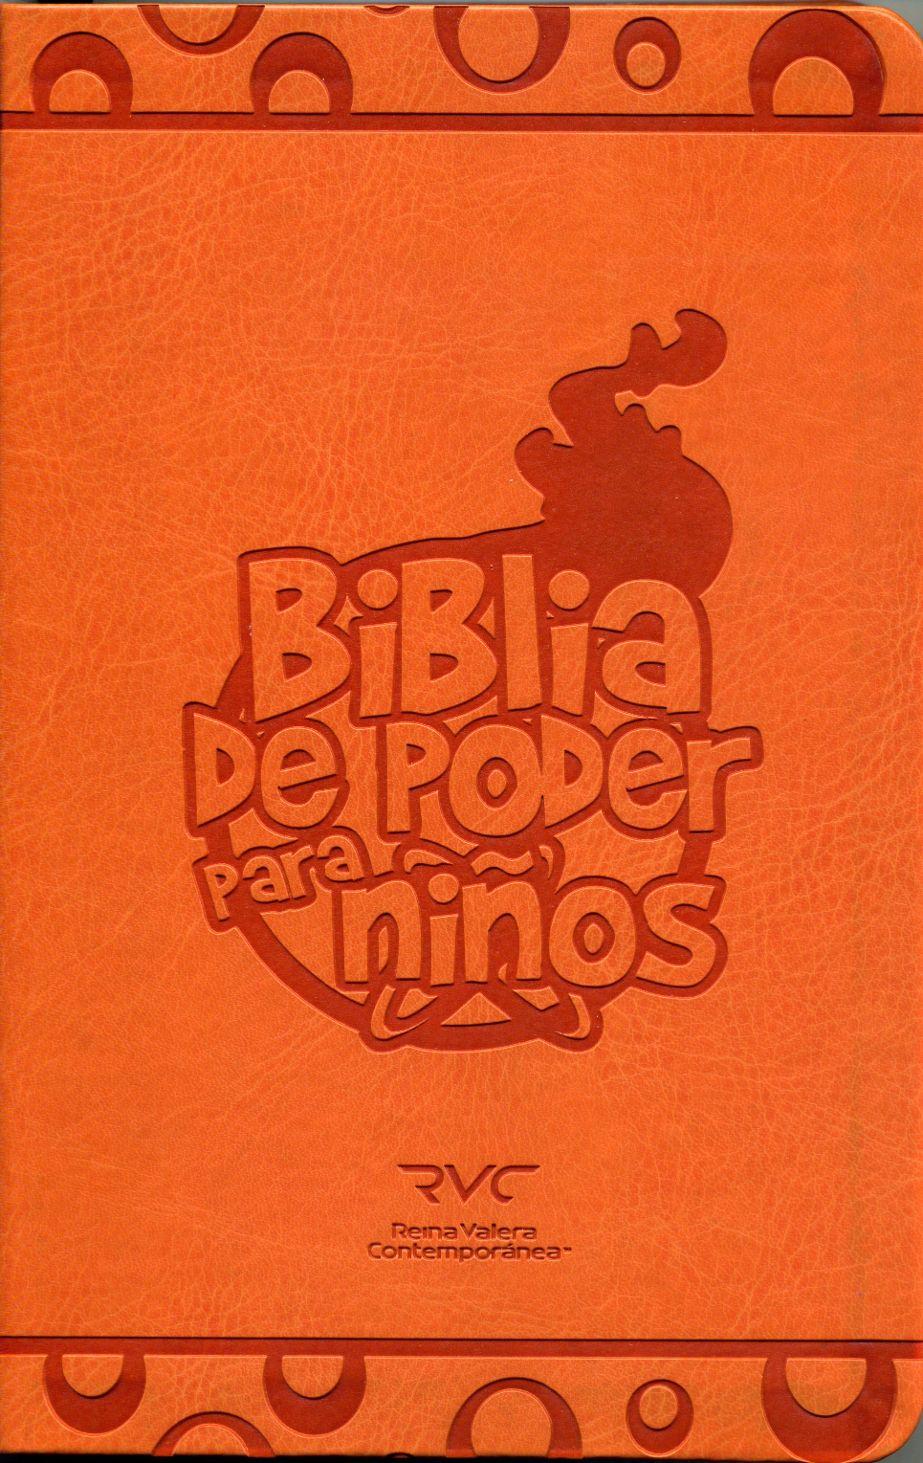 B RVC DE PODER PARA NIÑOS IMIT CUERO NARANJA